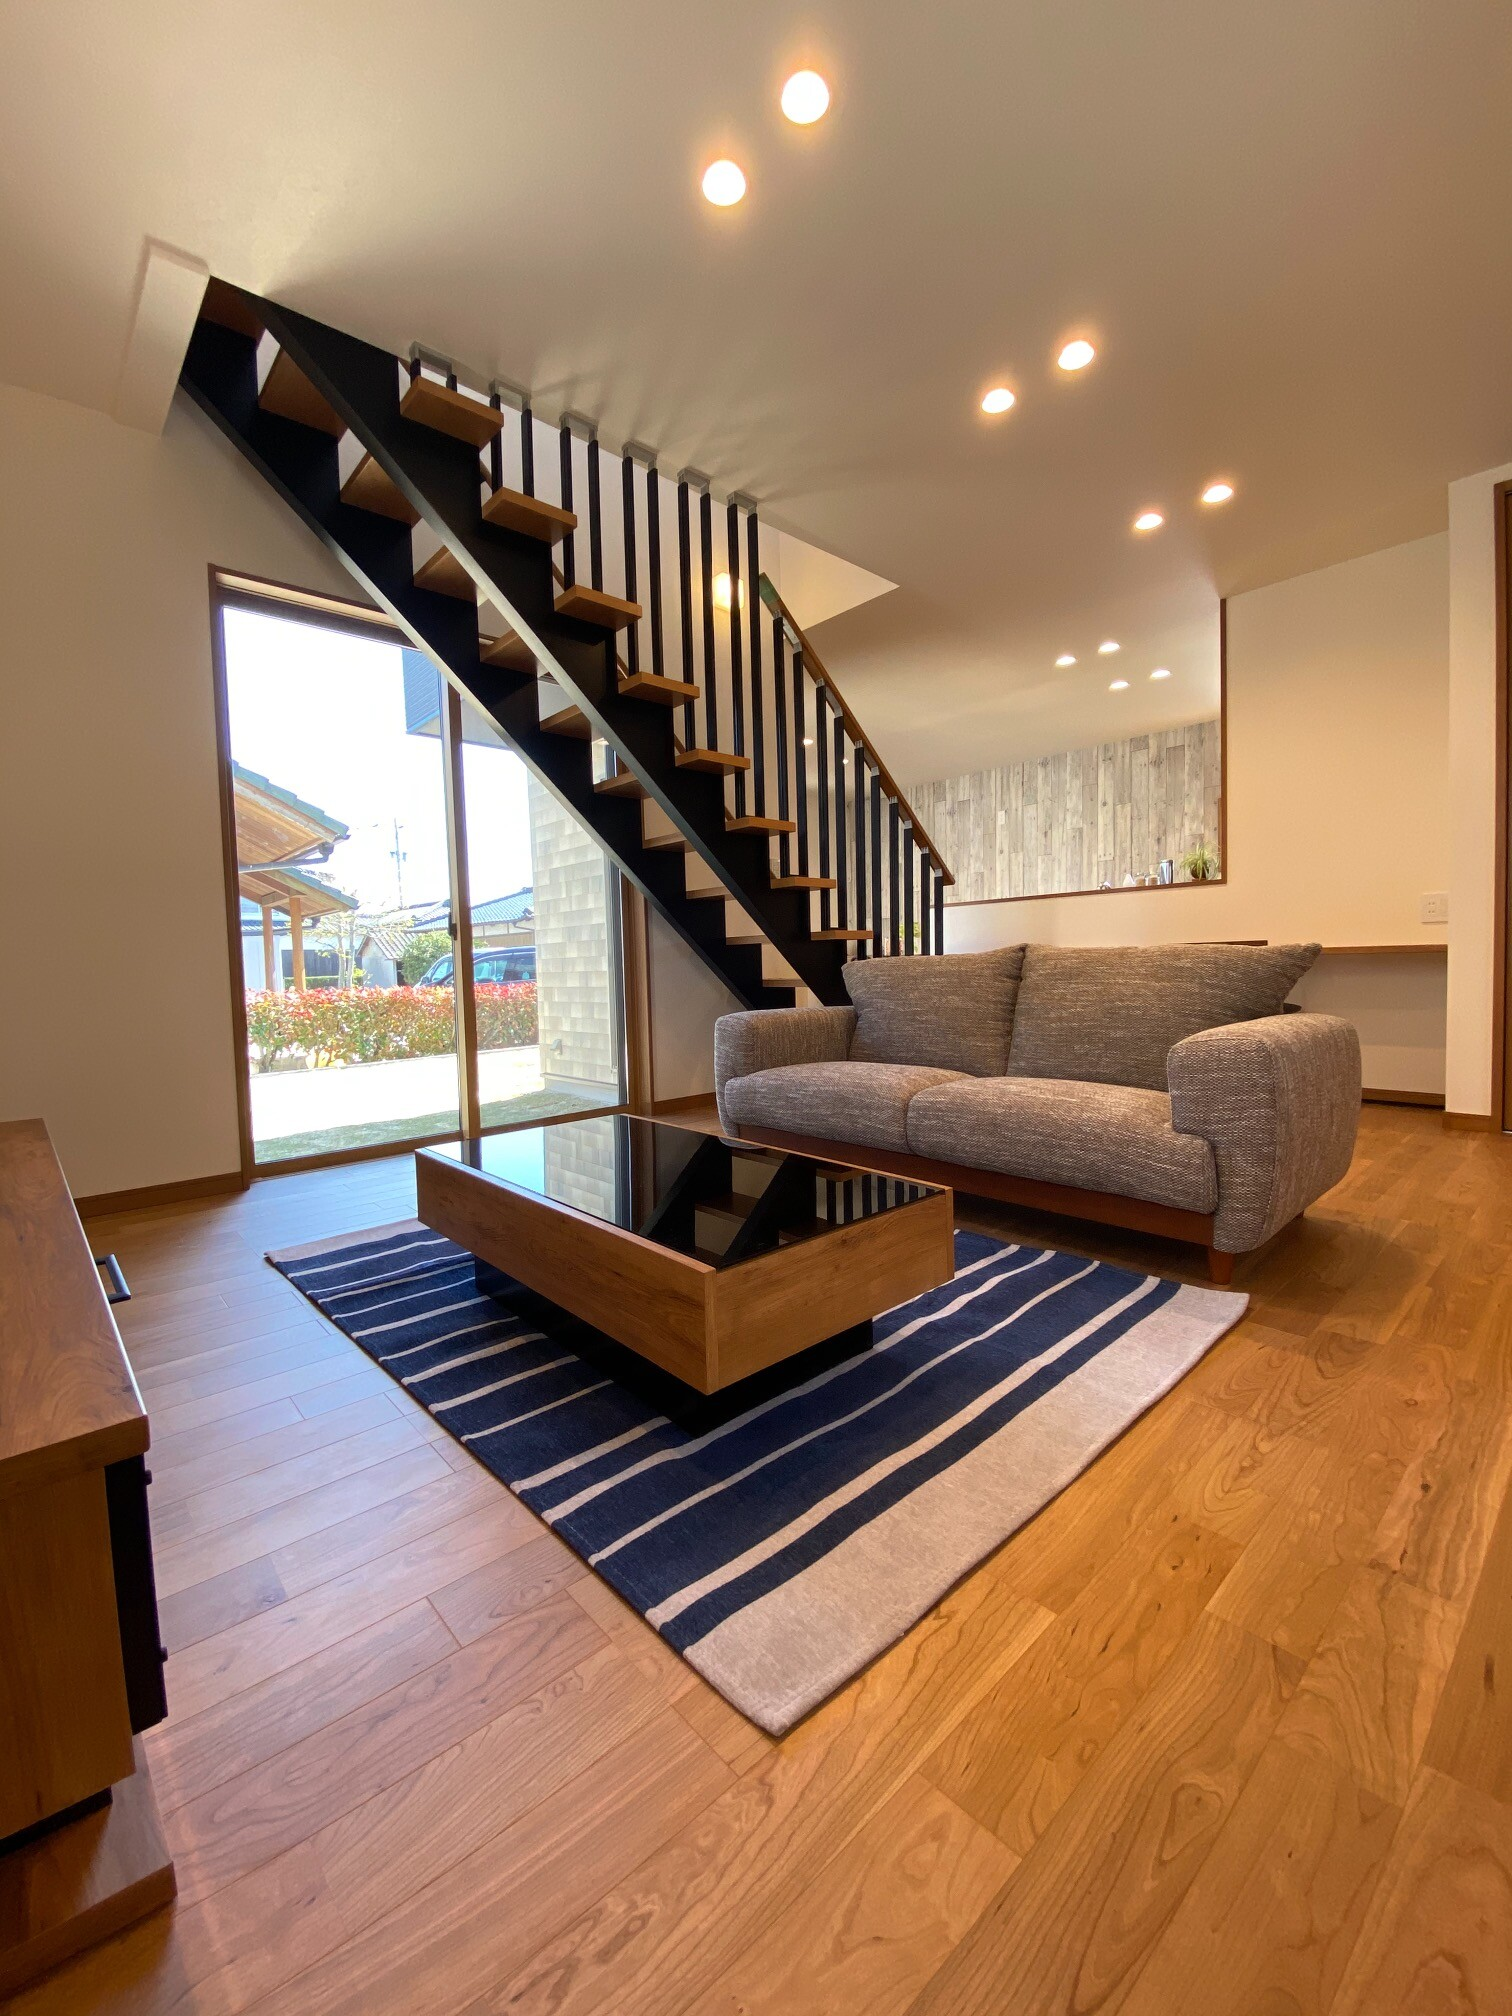 小城市新築戸建建売住宅【OURS三日月】リビング階段